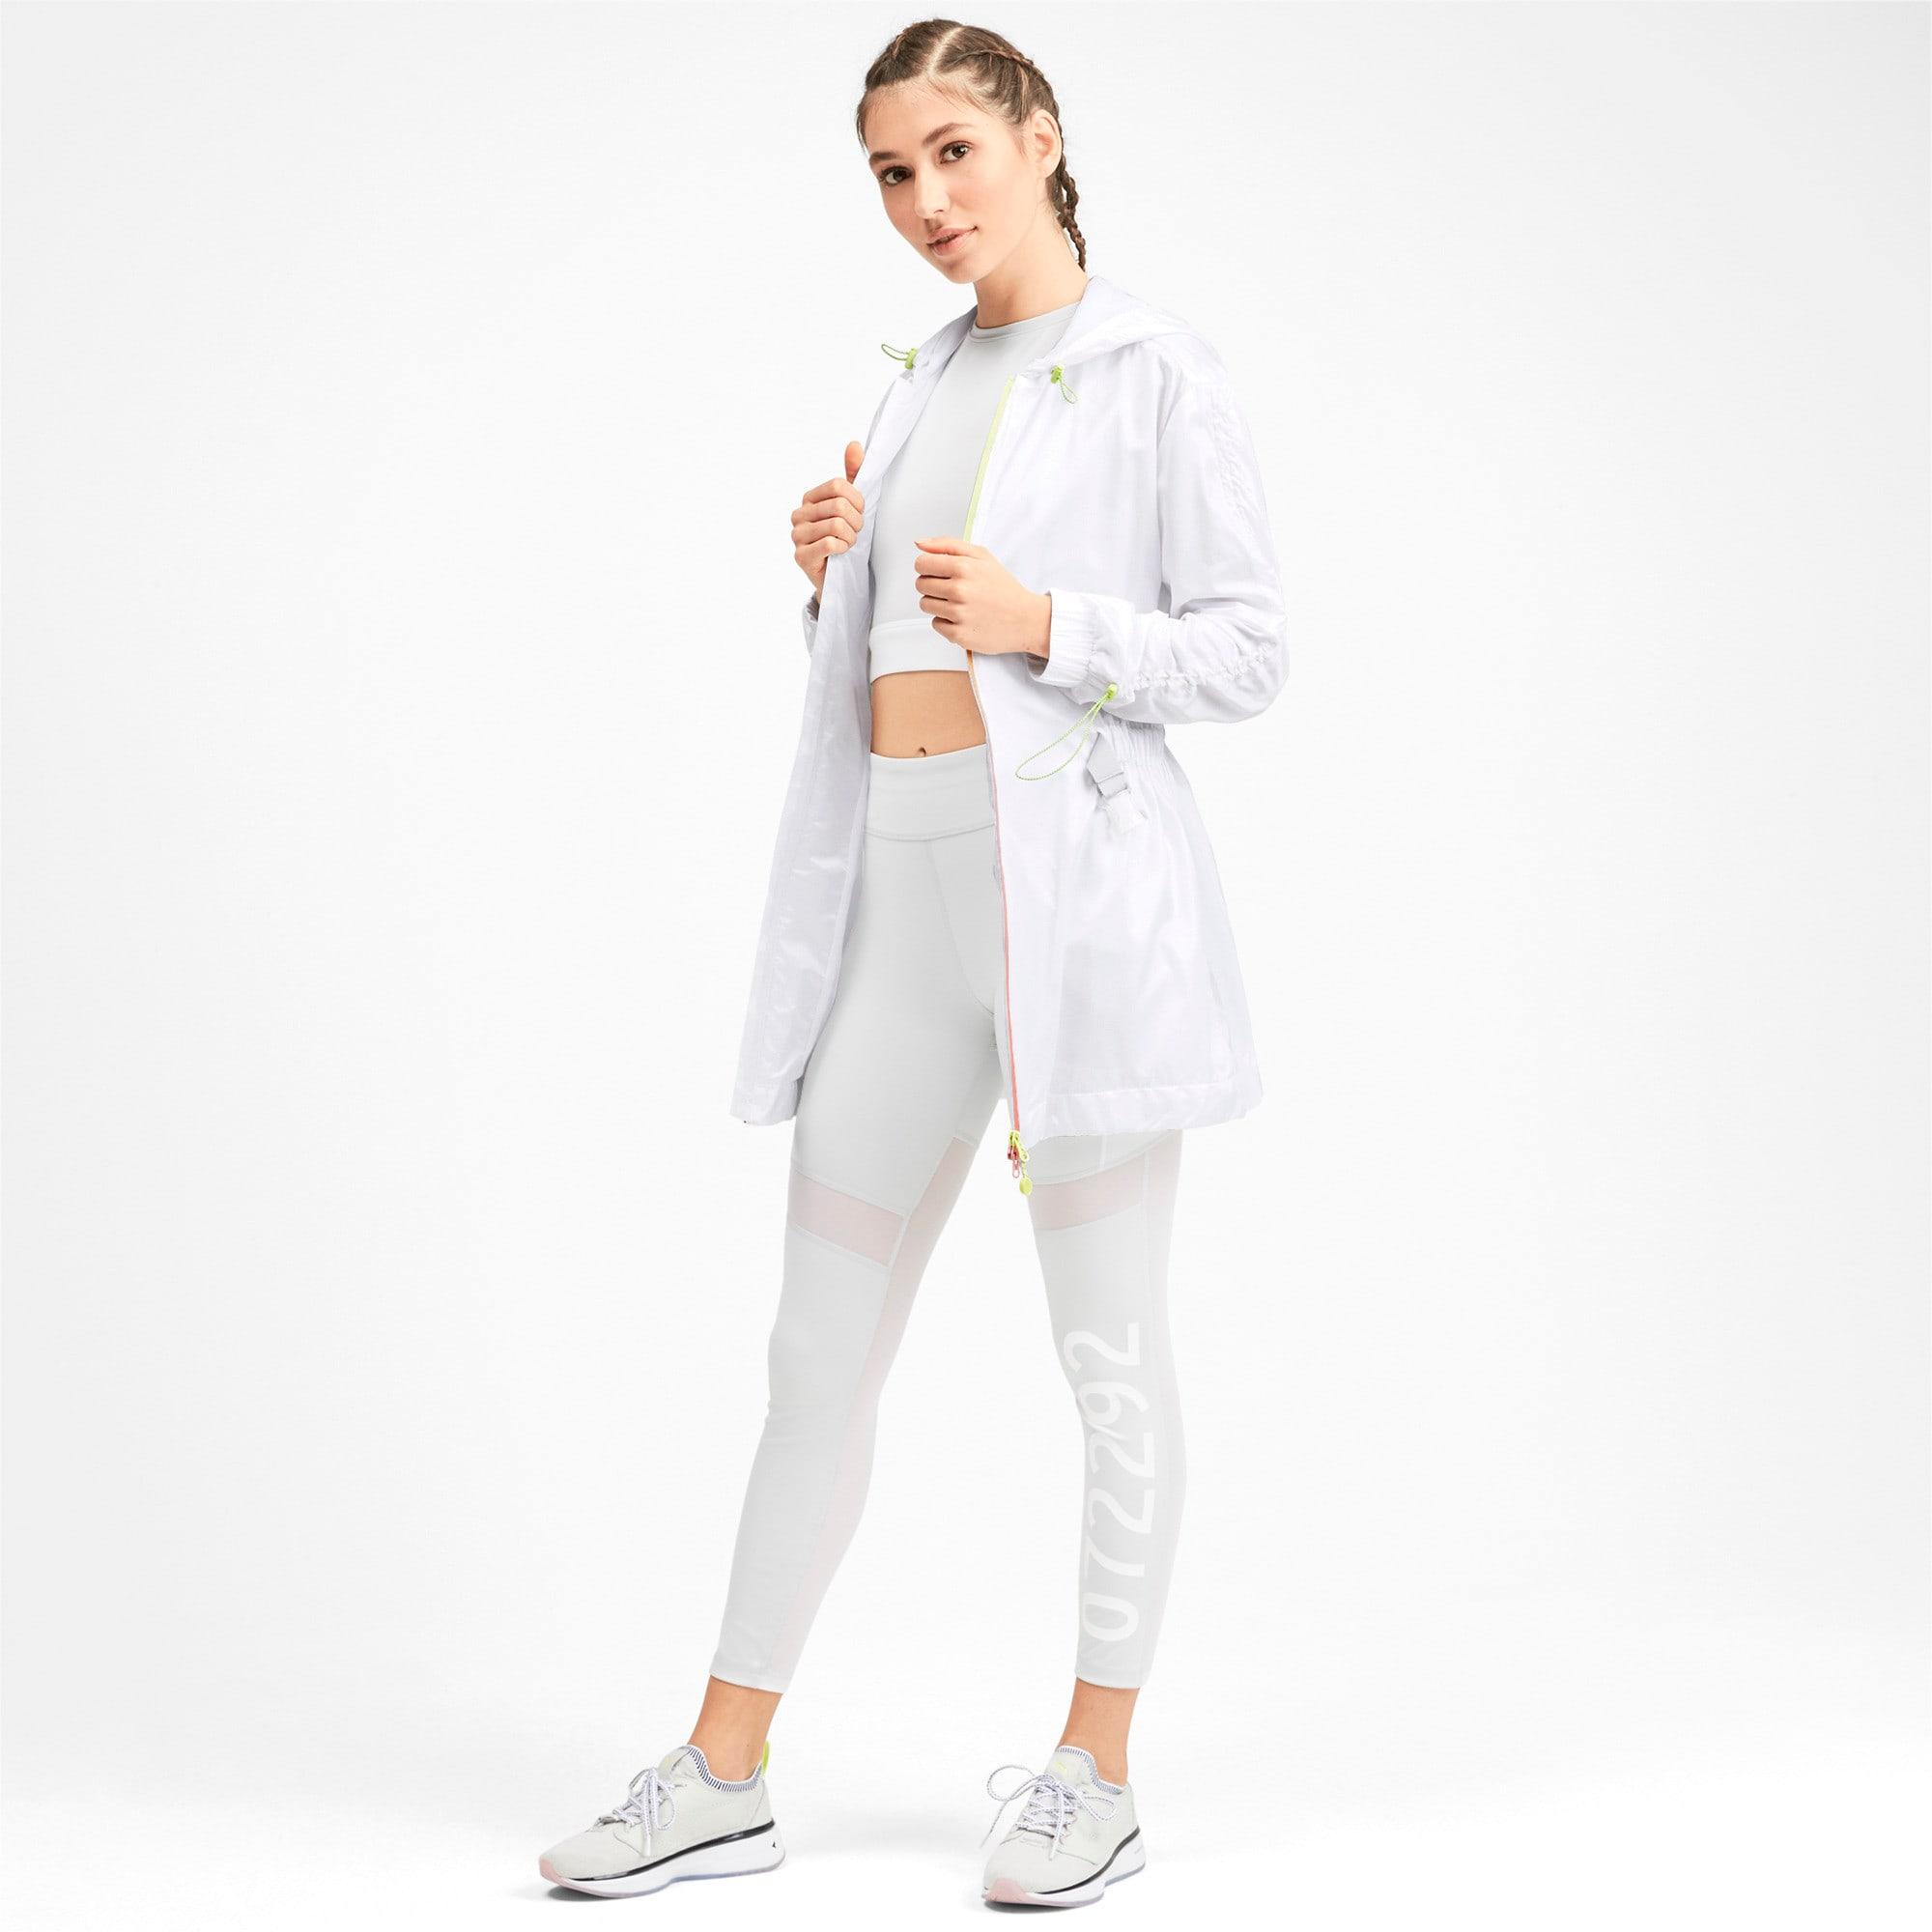 Thumbnail 3 of PUMA x SELENA GOMEZ Hooded Women's Jacket, Puma White, medium